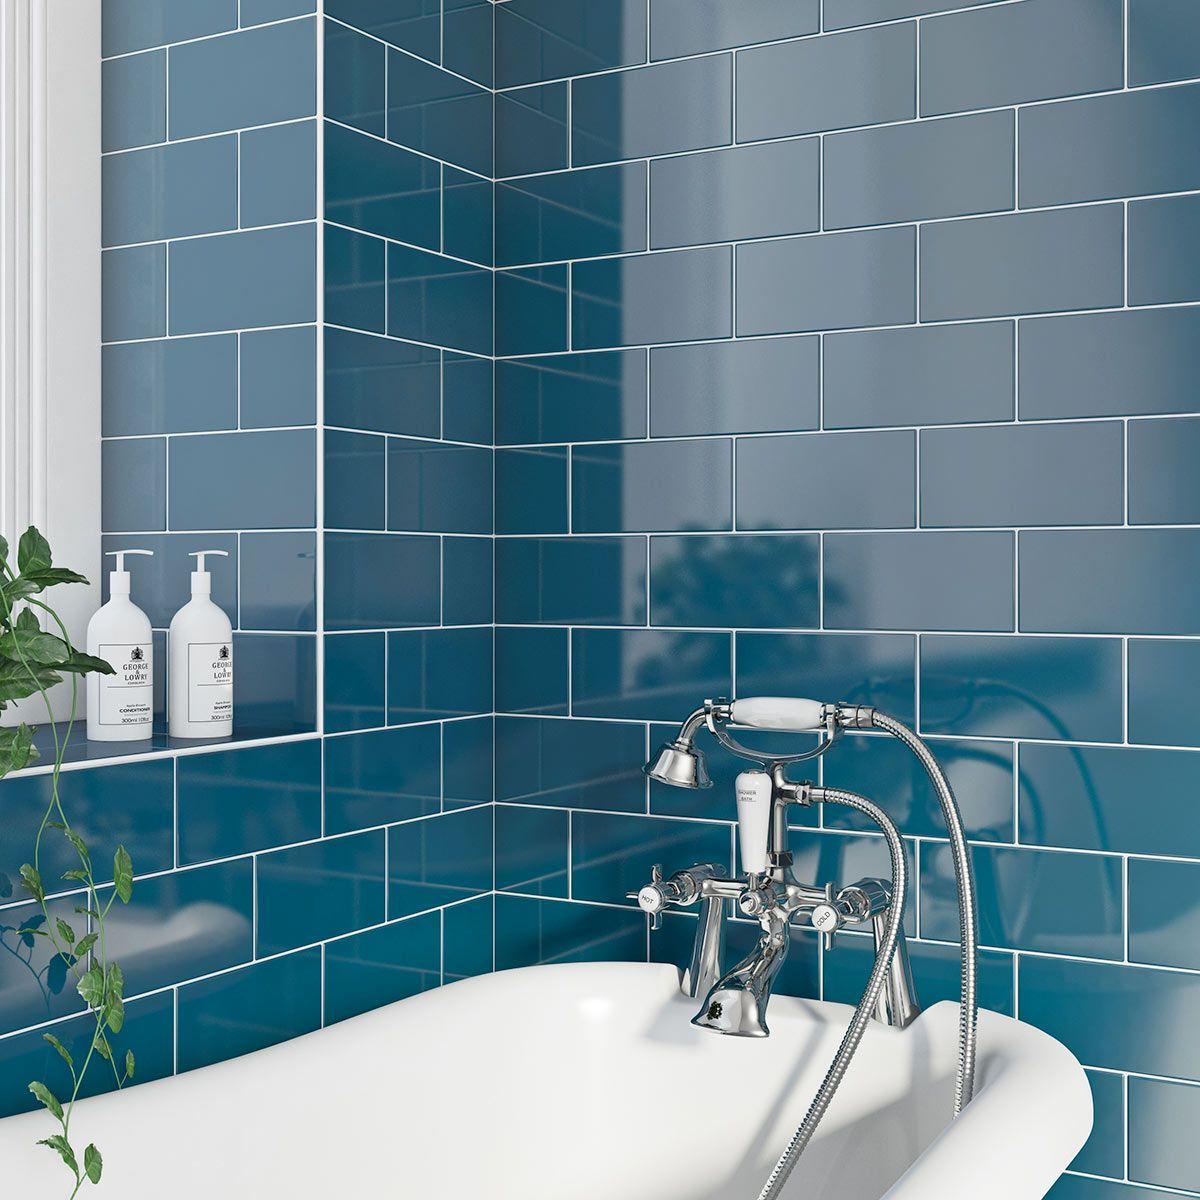 19.99 | bathroom | Pinterest | Taps, Metro tiles and Bath